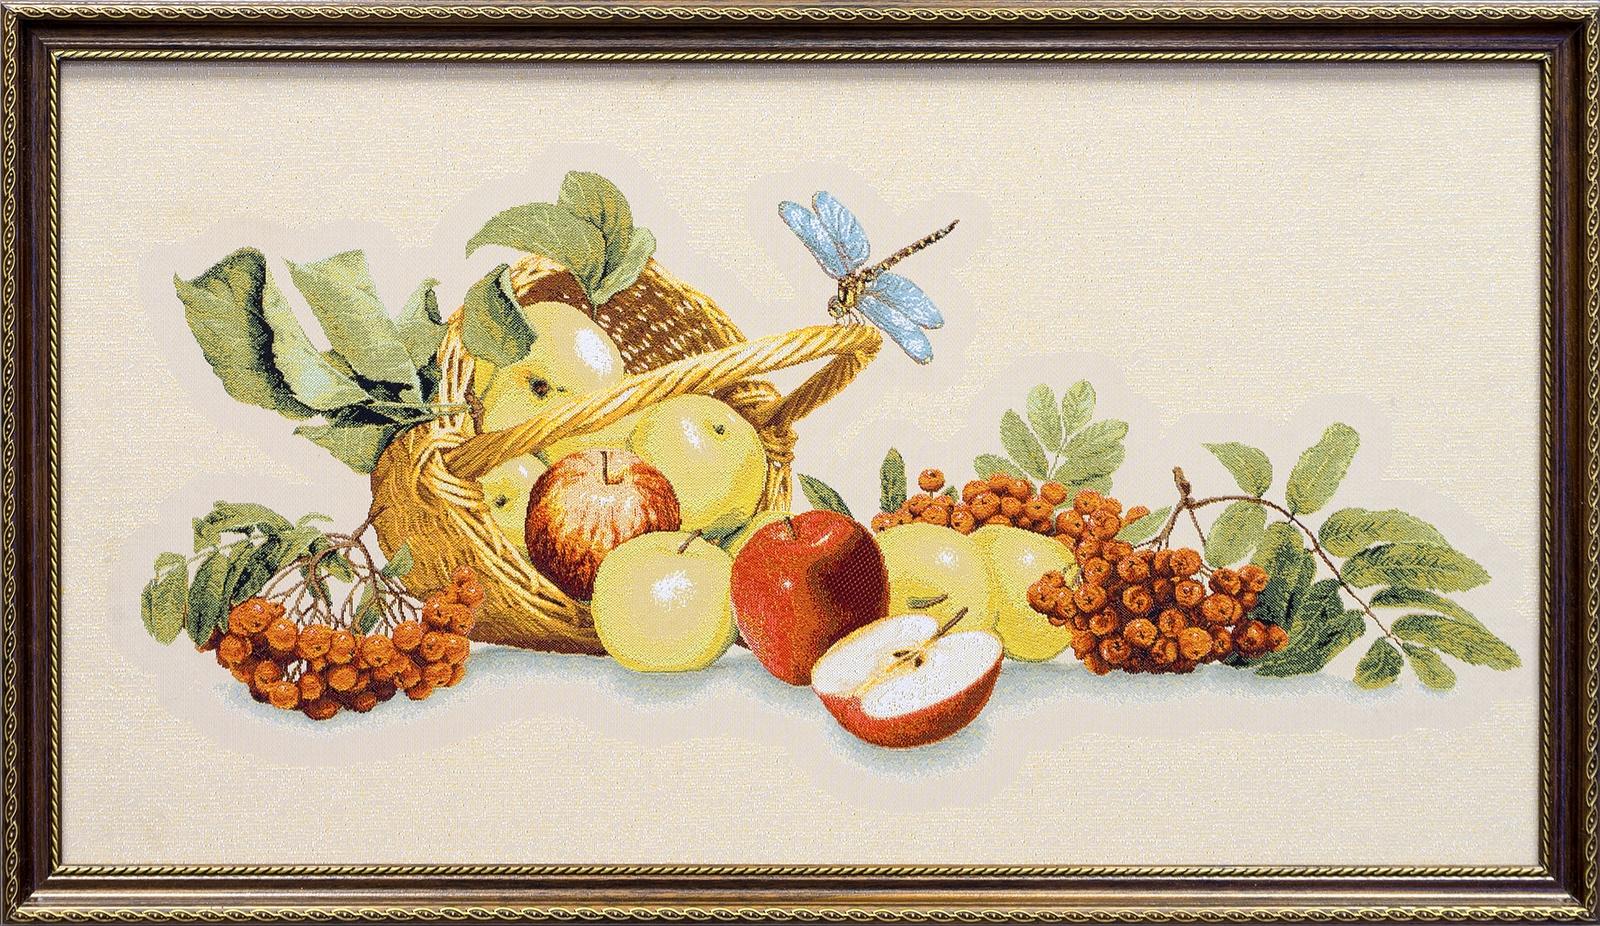 Картина Магазин гобеленов натюрморт с фруктами 39*62 см, Гобелен